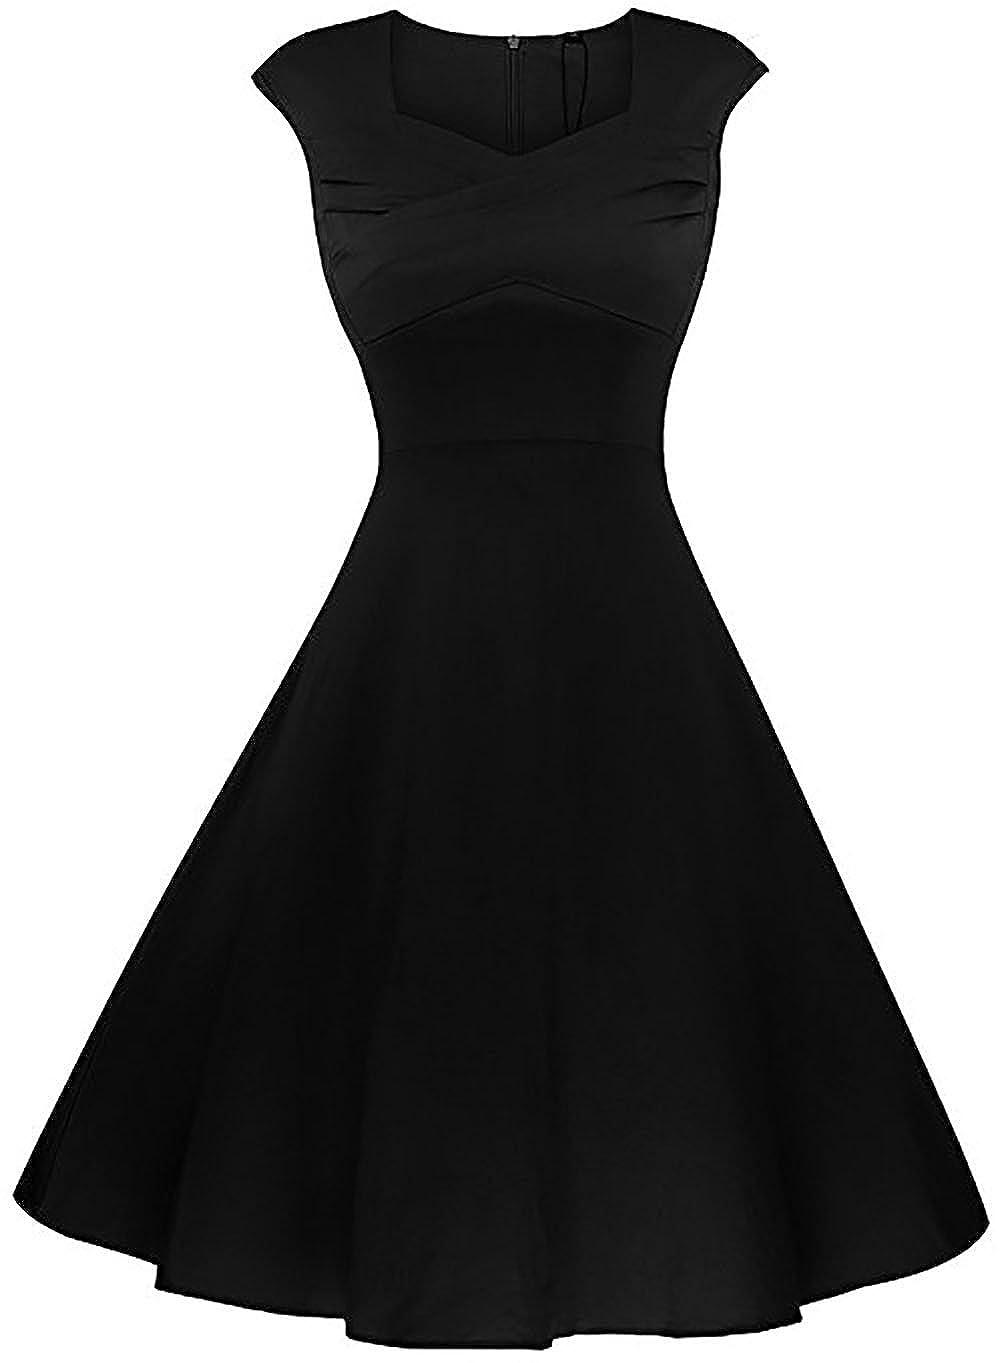 Black3 Beauty Decor Women's Elegant Dress ALine Cap Sleeve V Neck Little Cocktail Party Dresses